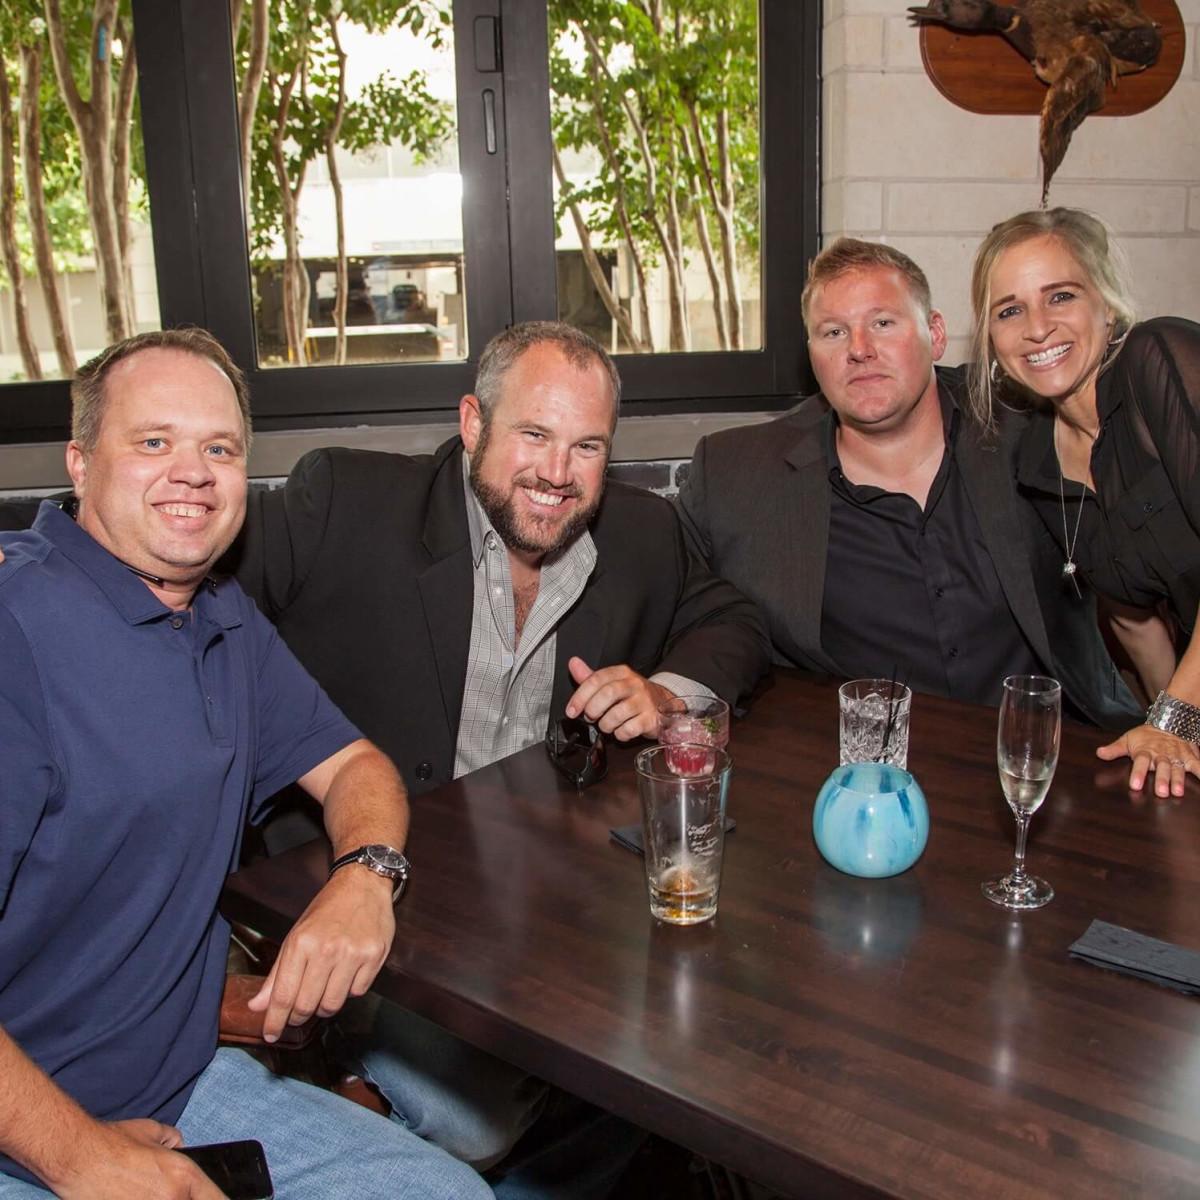 The General Public opening, 8/16, Matt Kooistra, Matt Trissel, Chad Stephens, Marissa Stephens